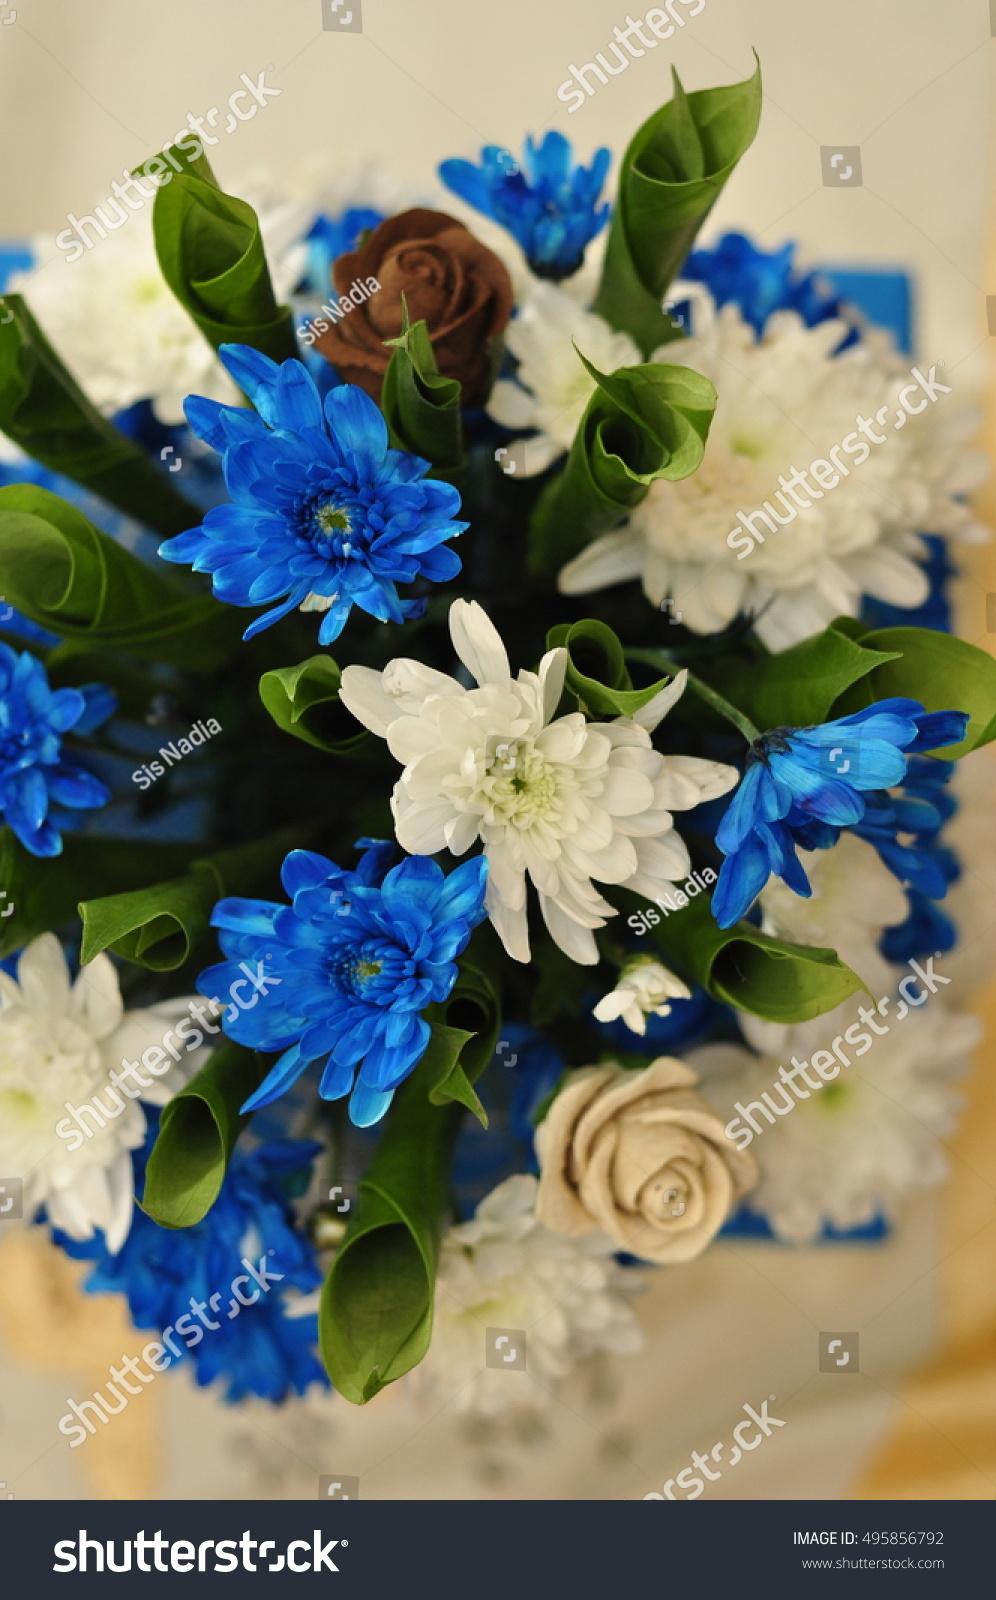 Blue white flower wedding decorations stock photo 495856792 blue and white flower as a wedding decorations izmirmasajfo